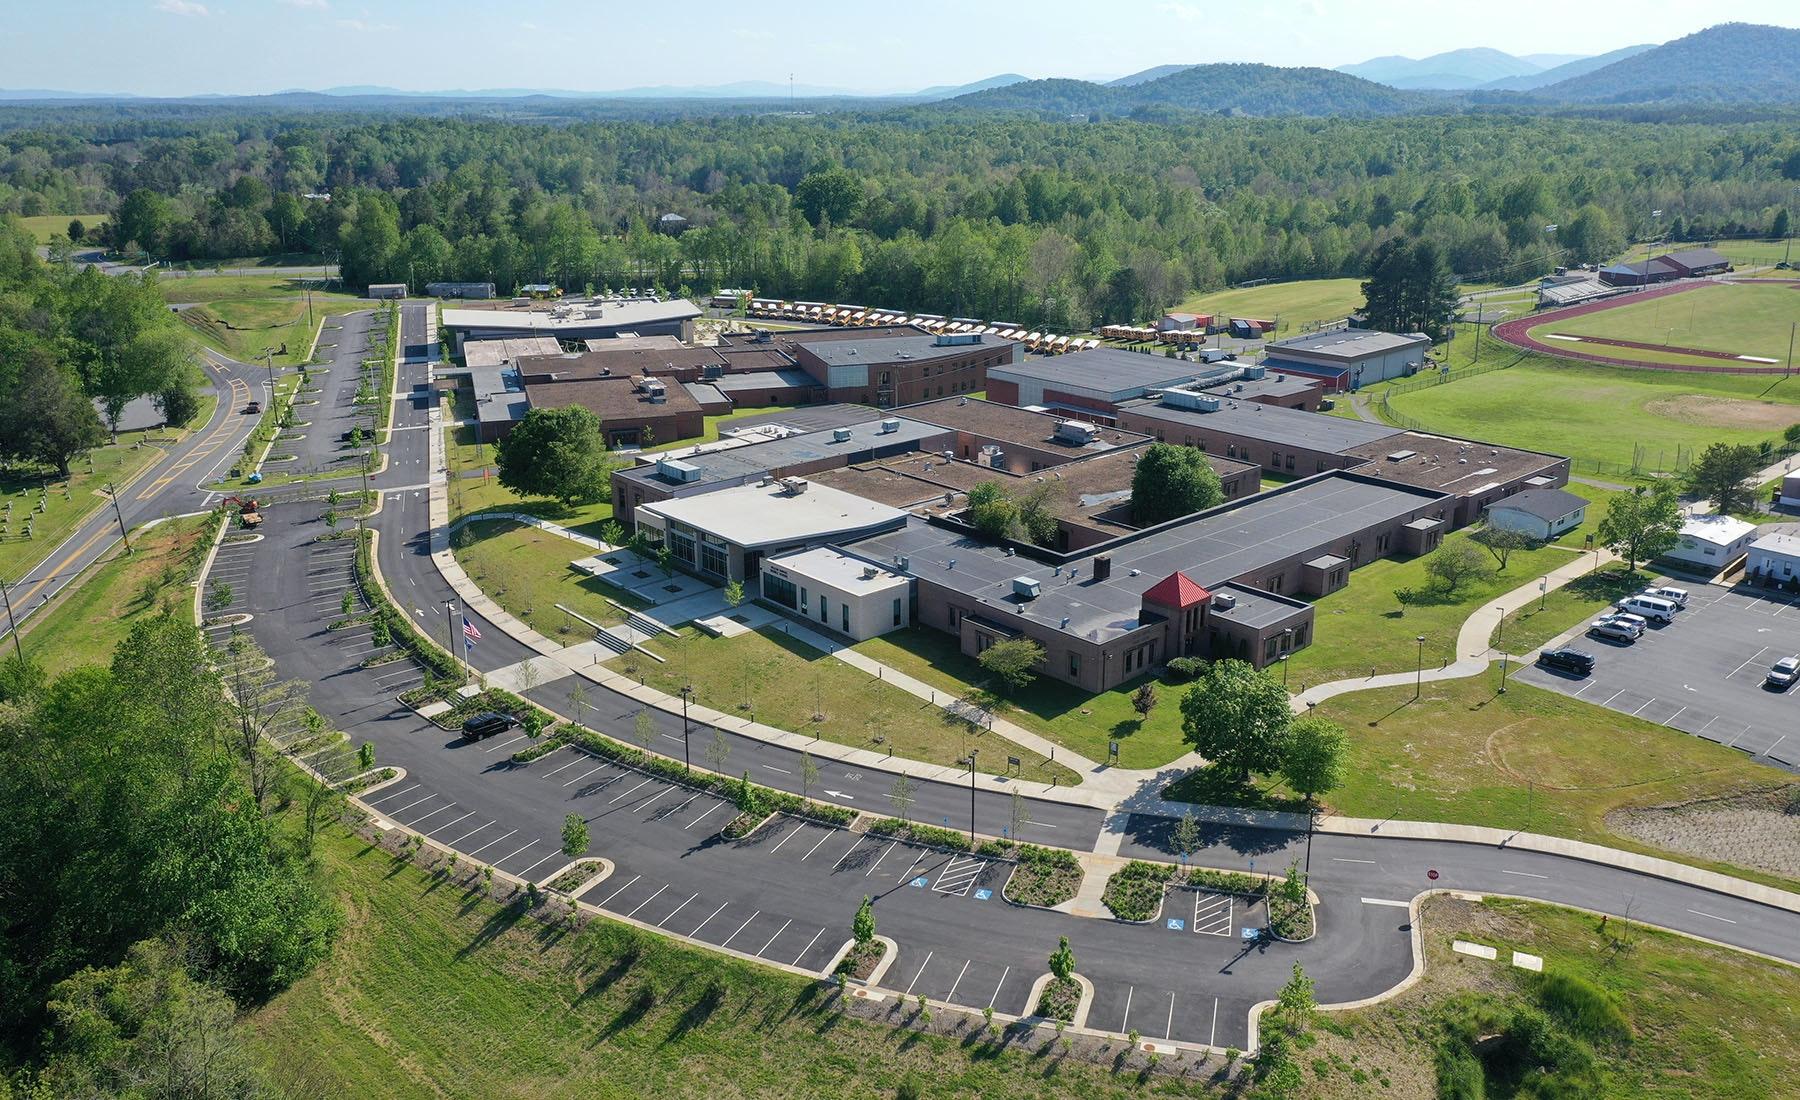 Greene County Public Schools William Monroe Middle School and High School